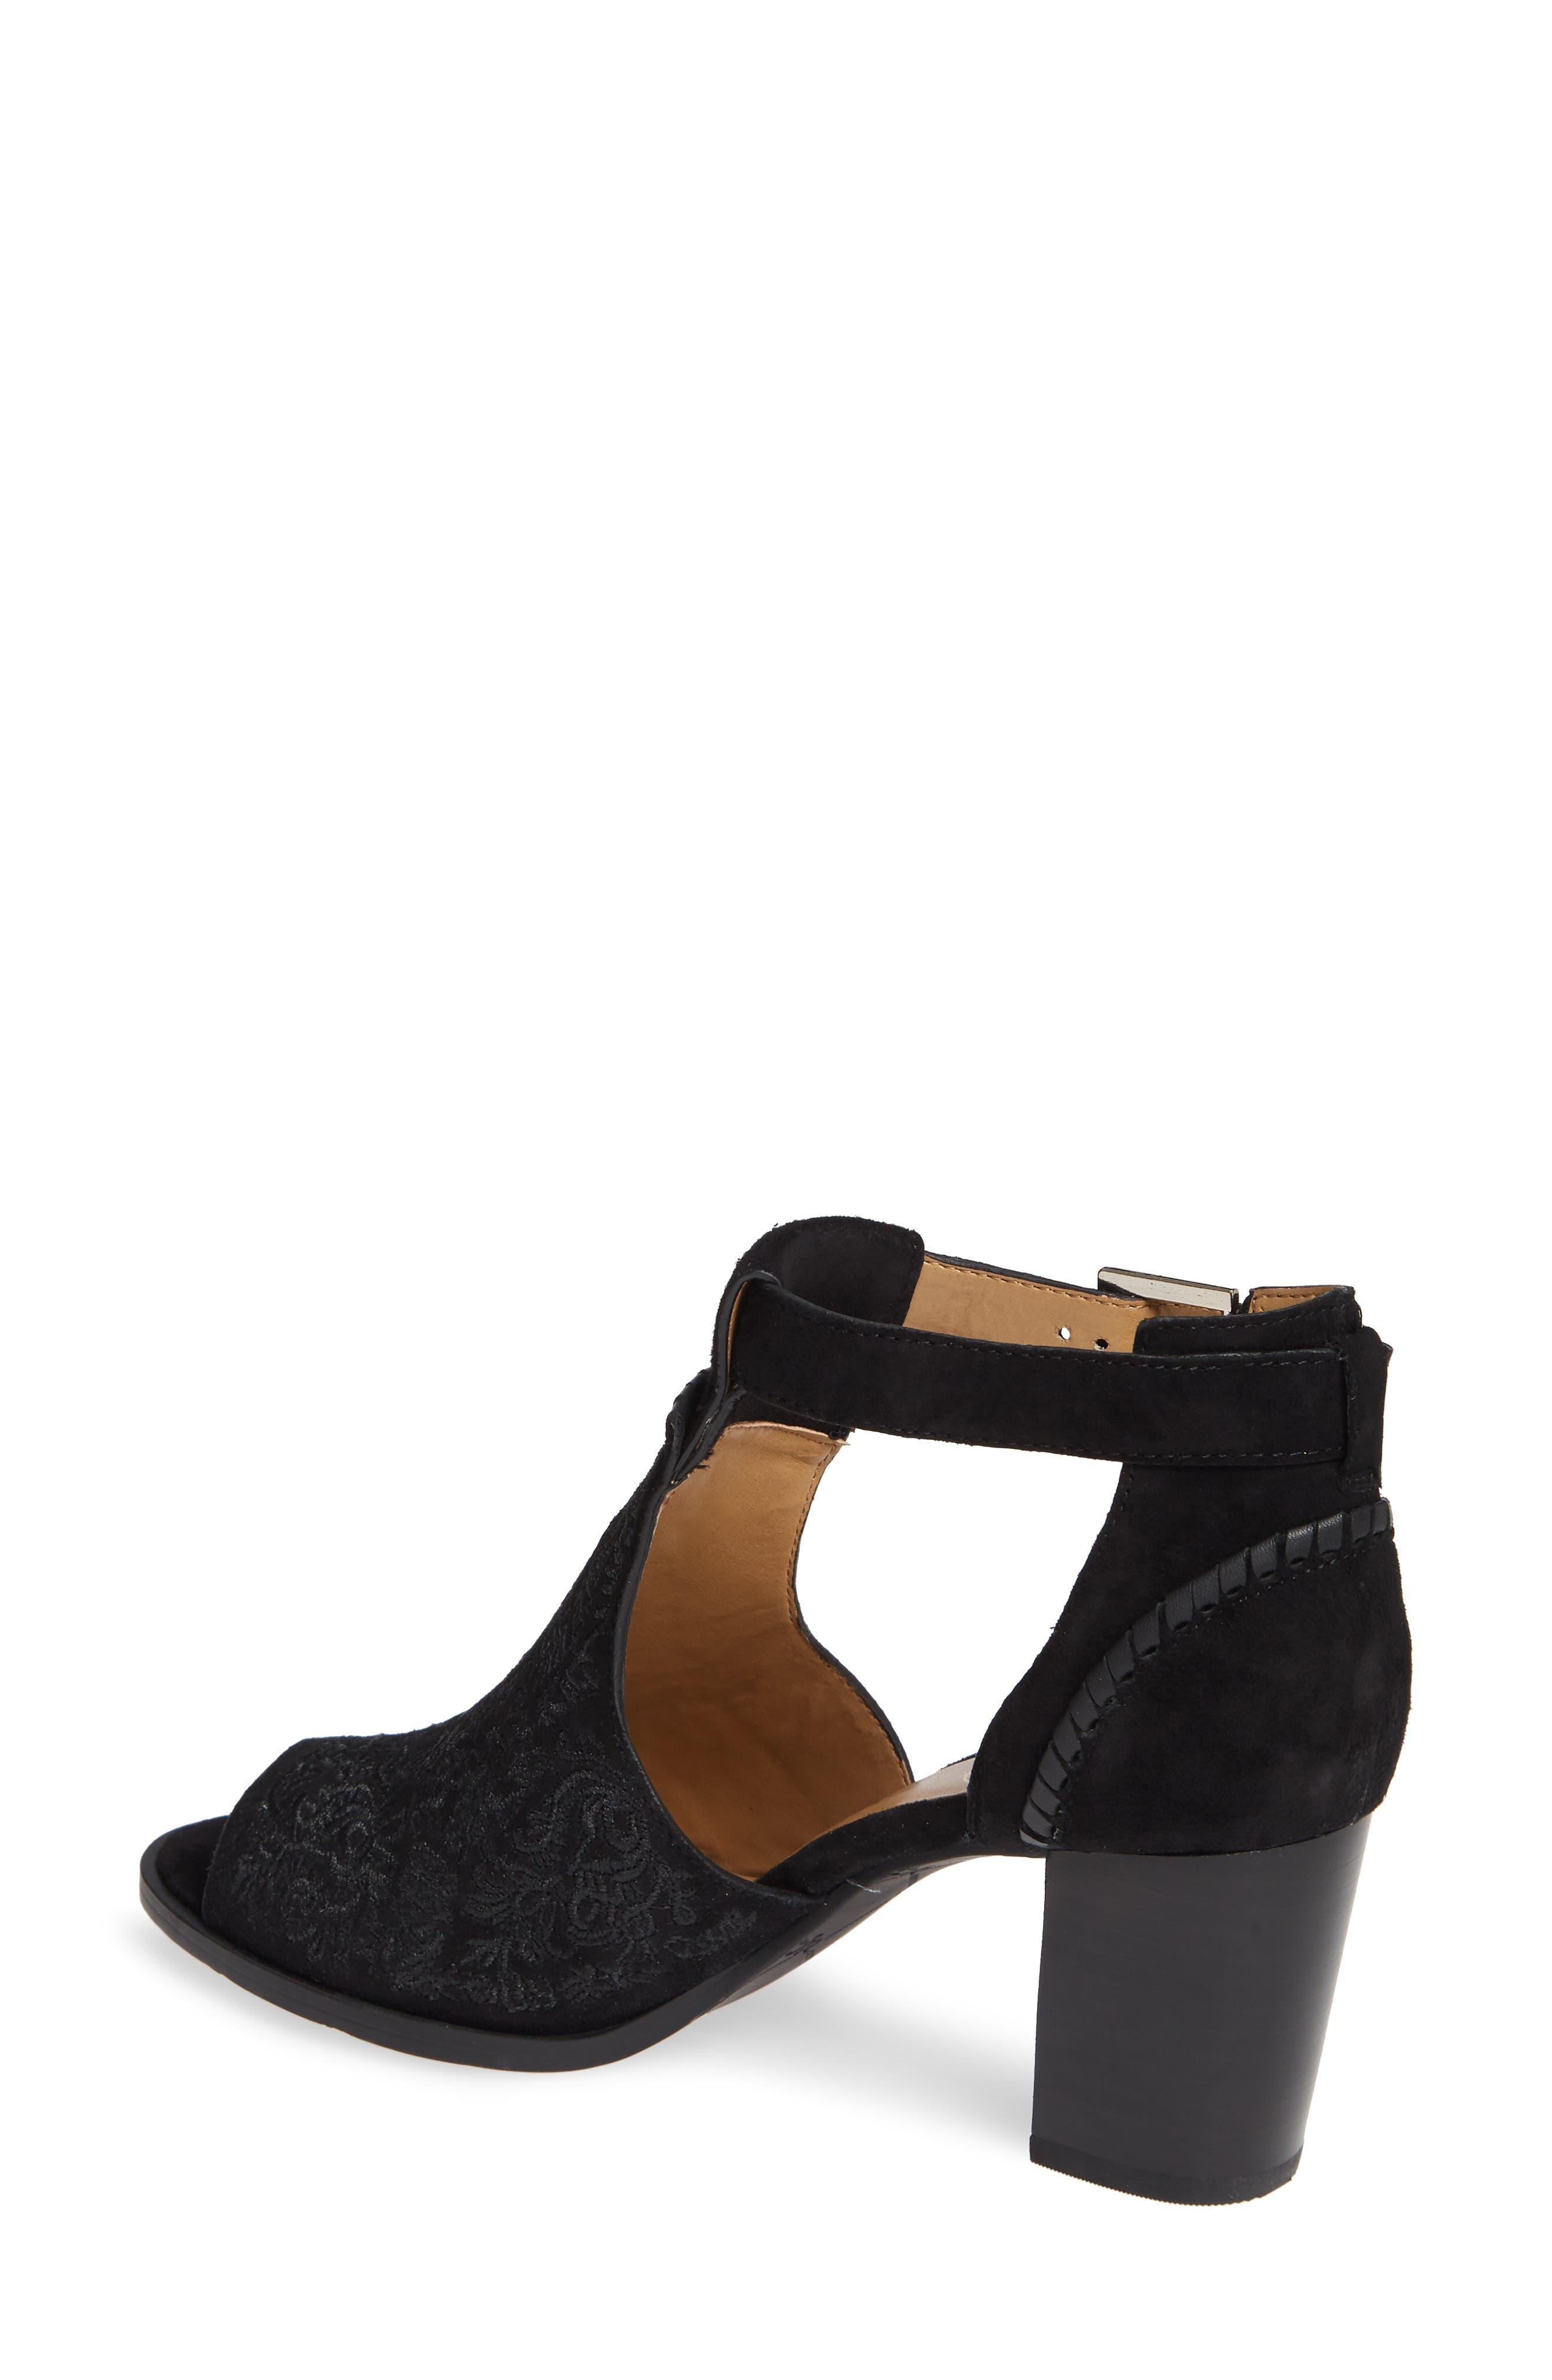 Cameron Block Heel Sandal,                             Alternate thumbnail 9, color,